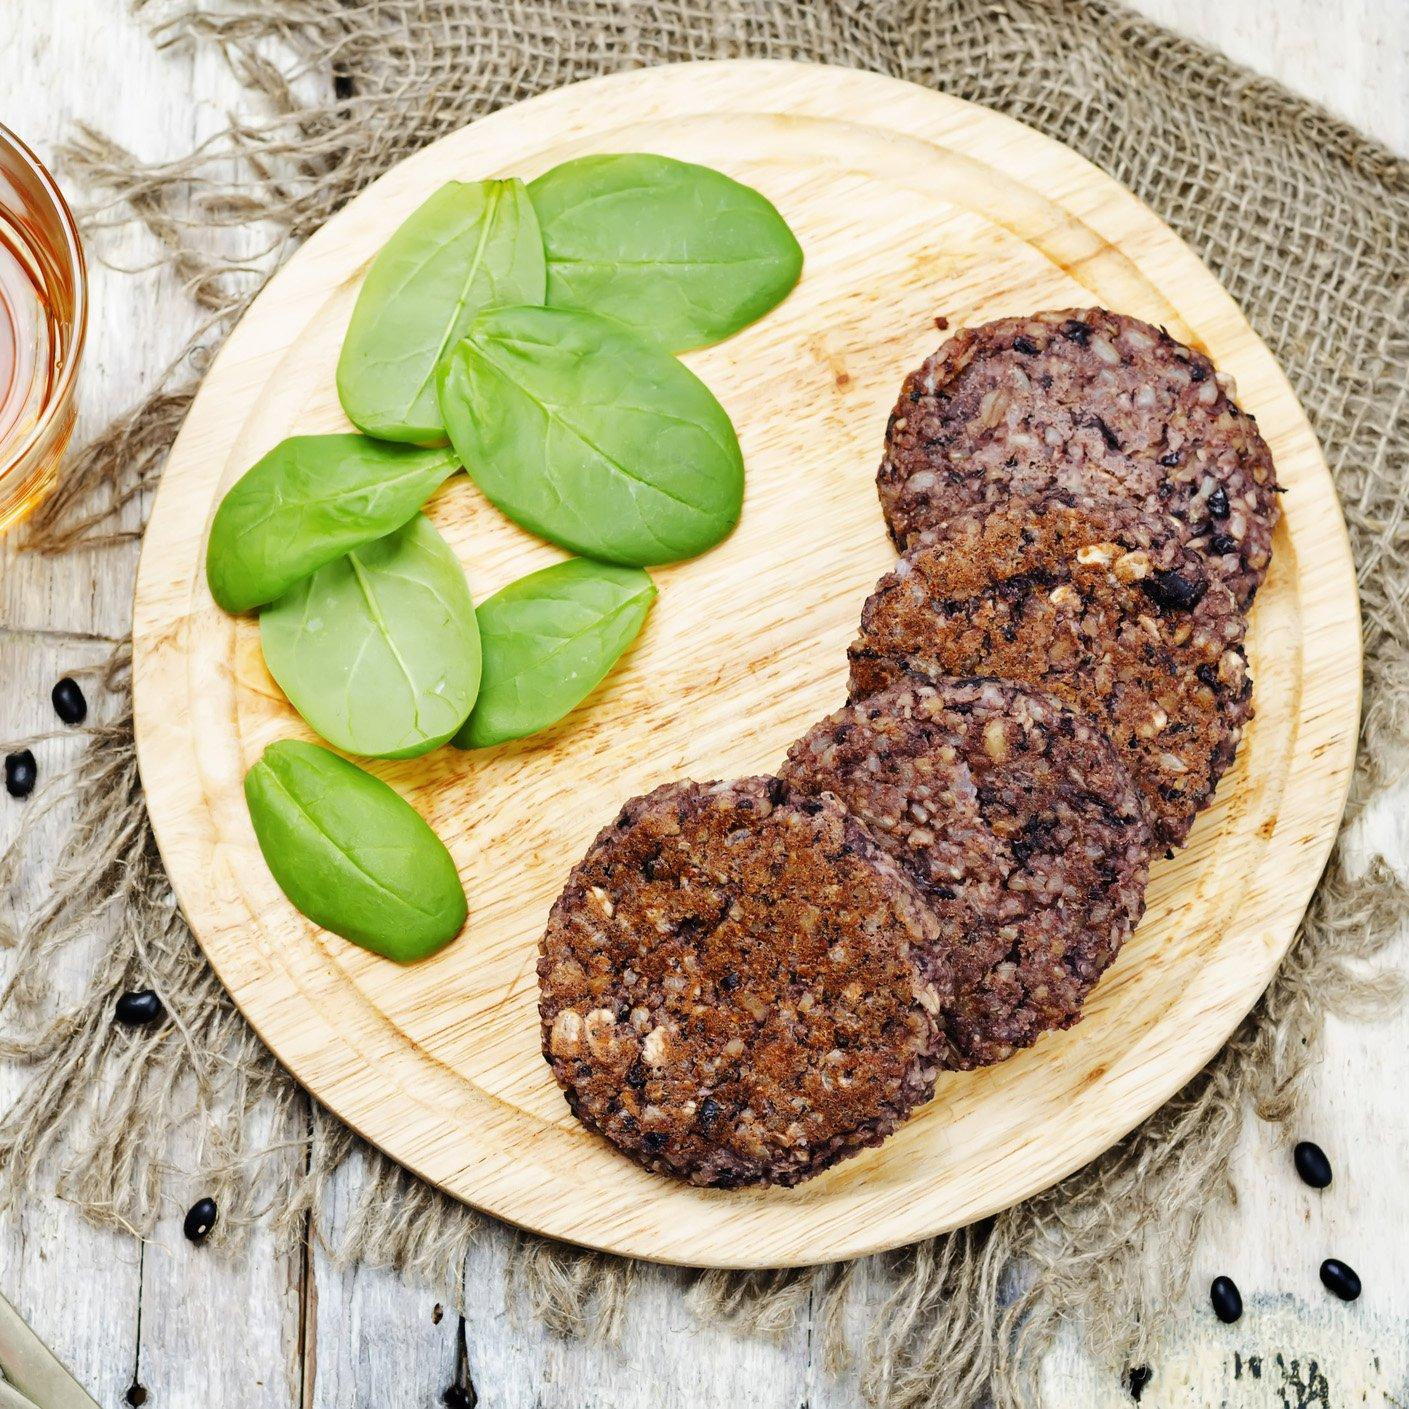 Augason Farms Gluten-Free Black Bean Burger 2 lbs 14 oz No. 10 Can by Augason Farms (Image #7)